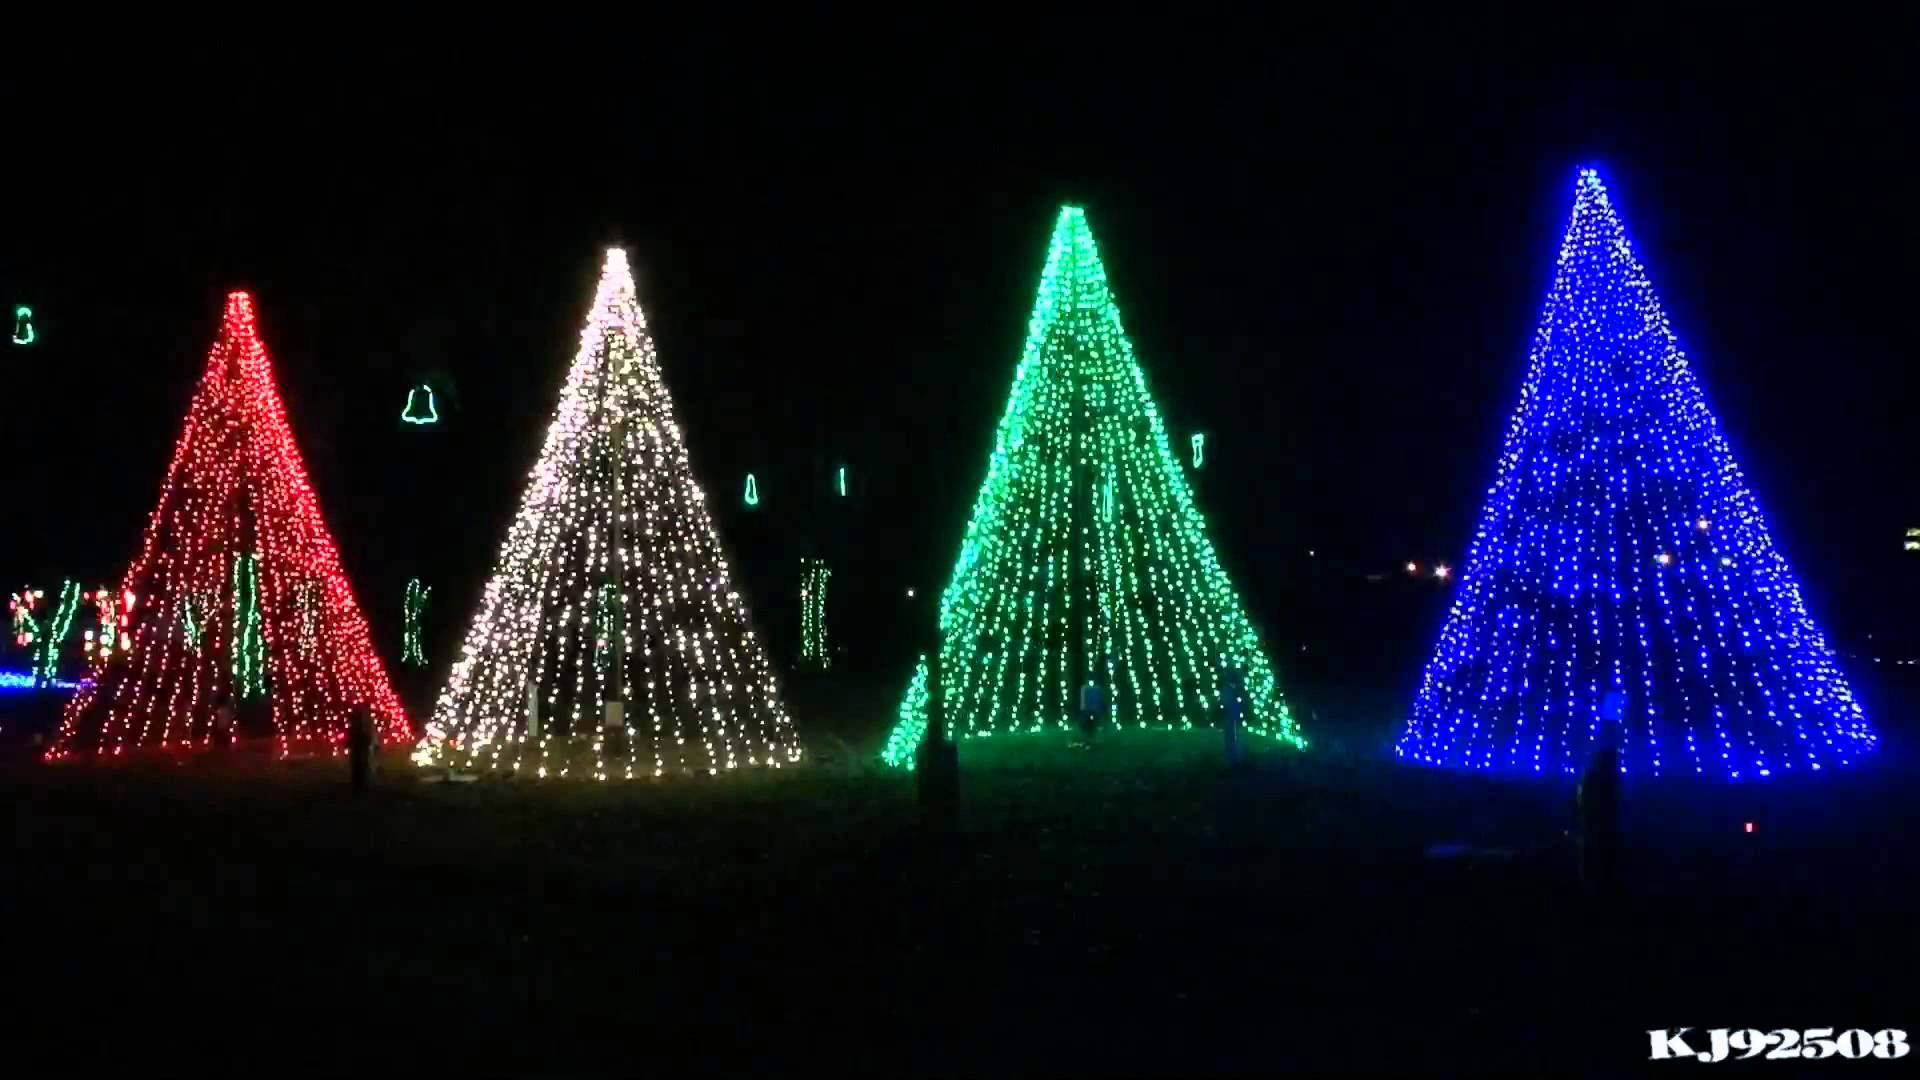 Christmas Light Show 2013 - Carol of the Bells (Nashville, TN ...